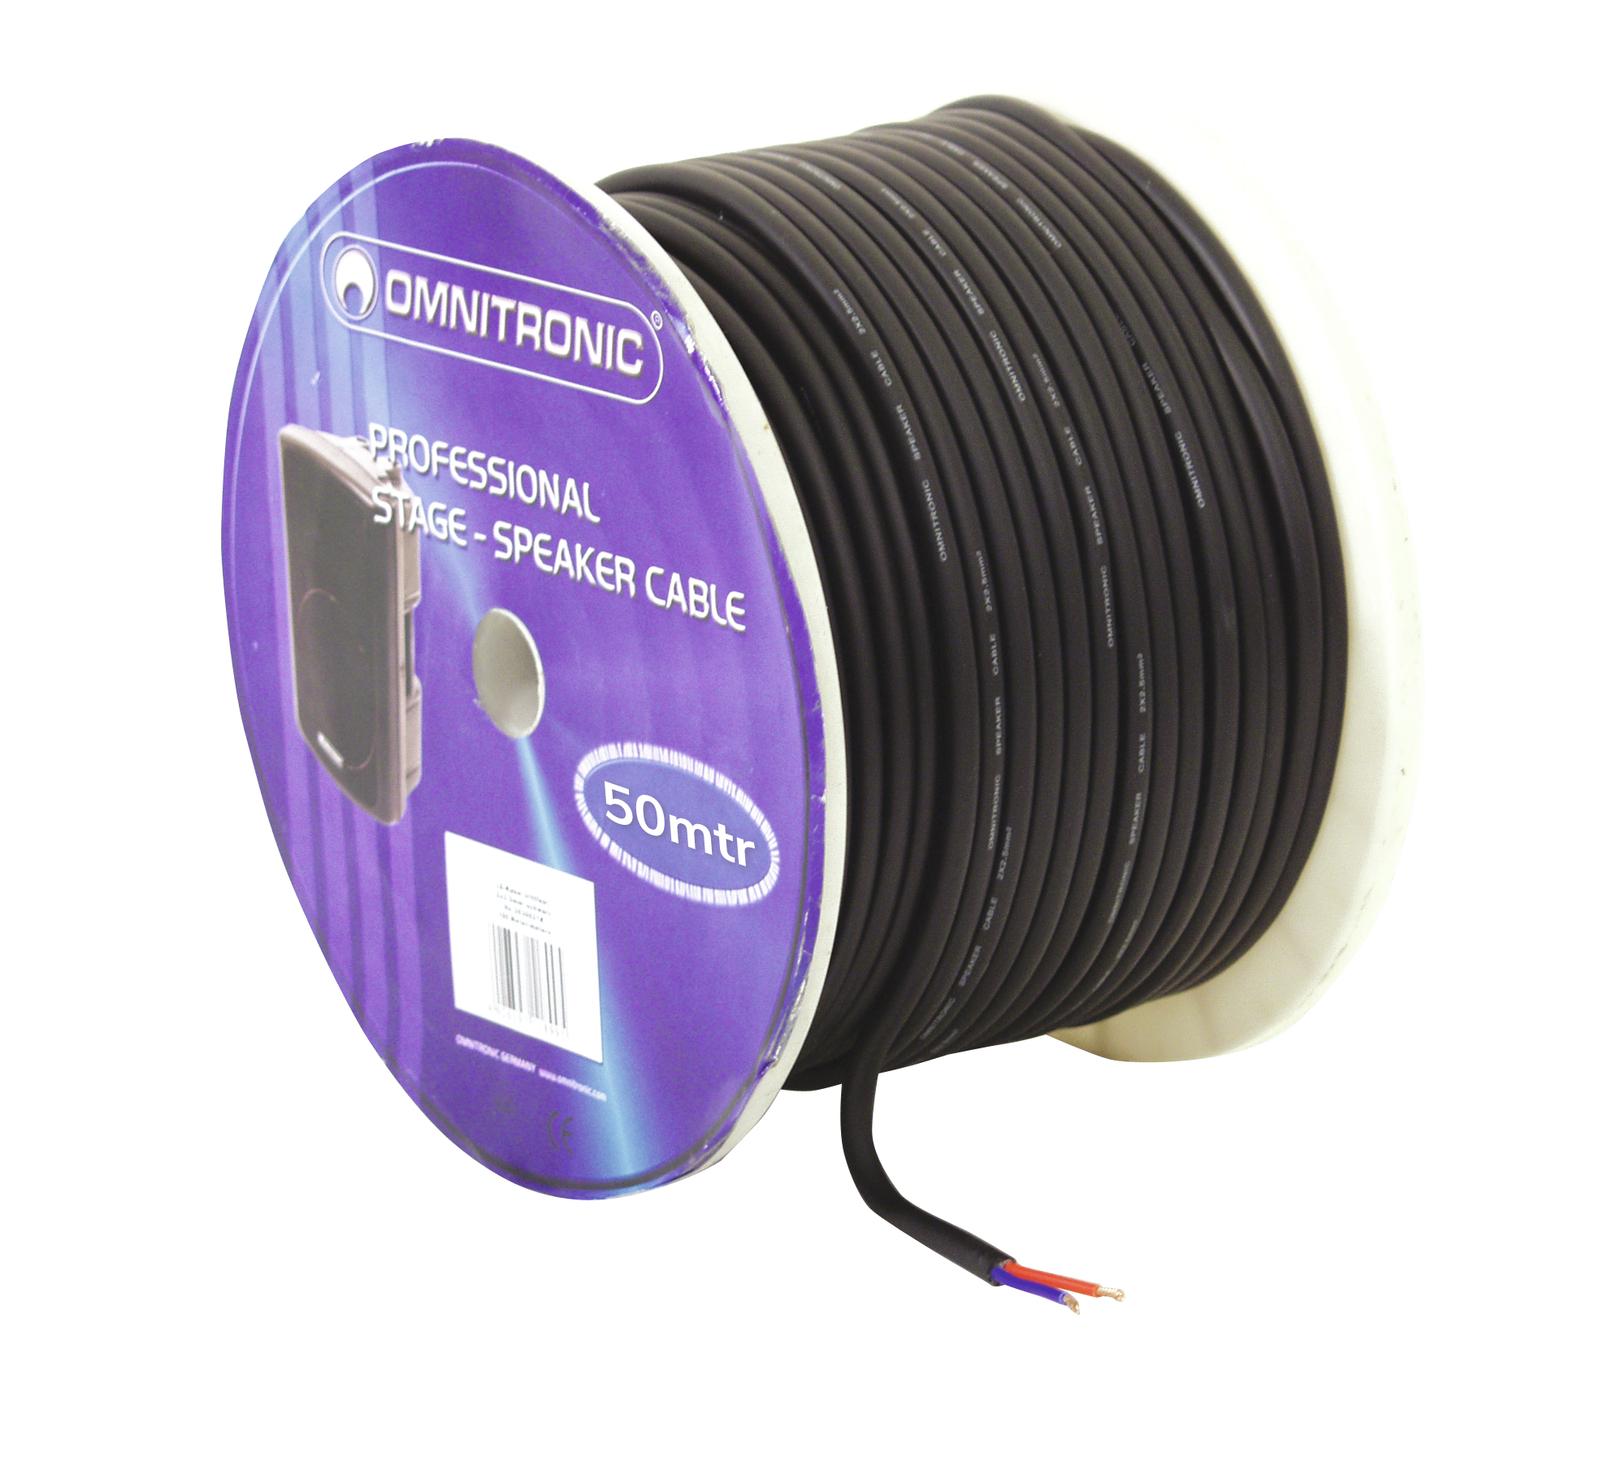 Cable Coil Coil Cable Bulk 2x2.5 50mt Omnitronic